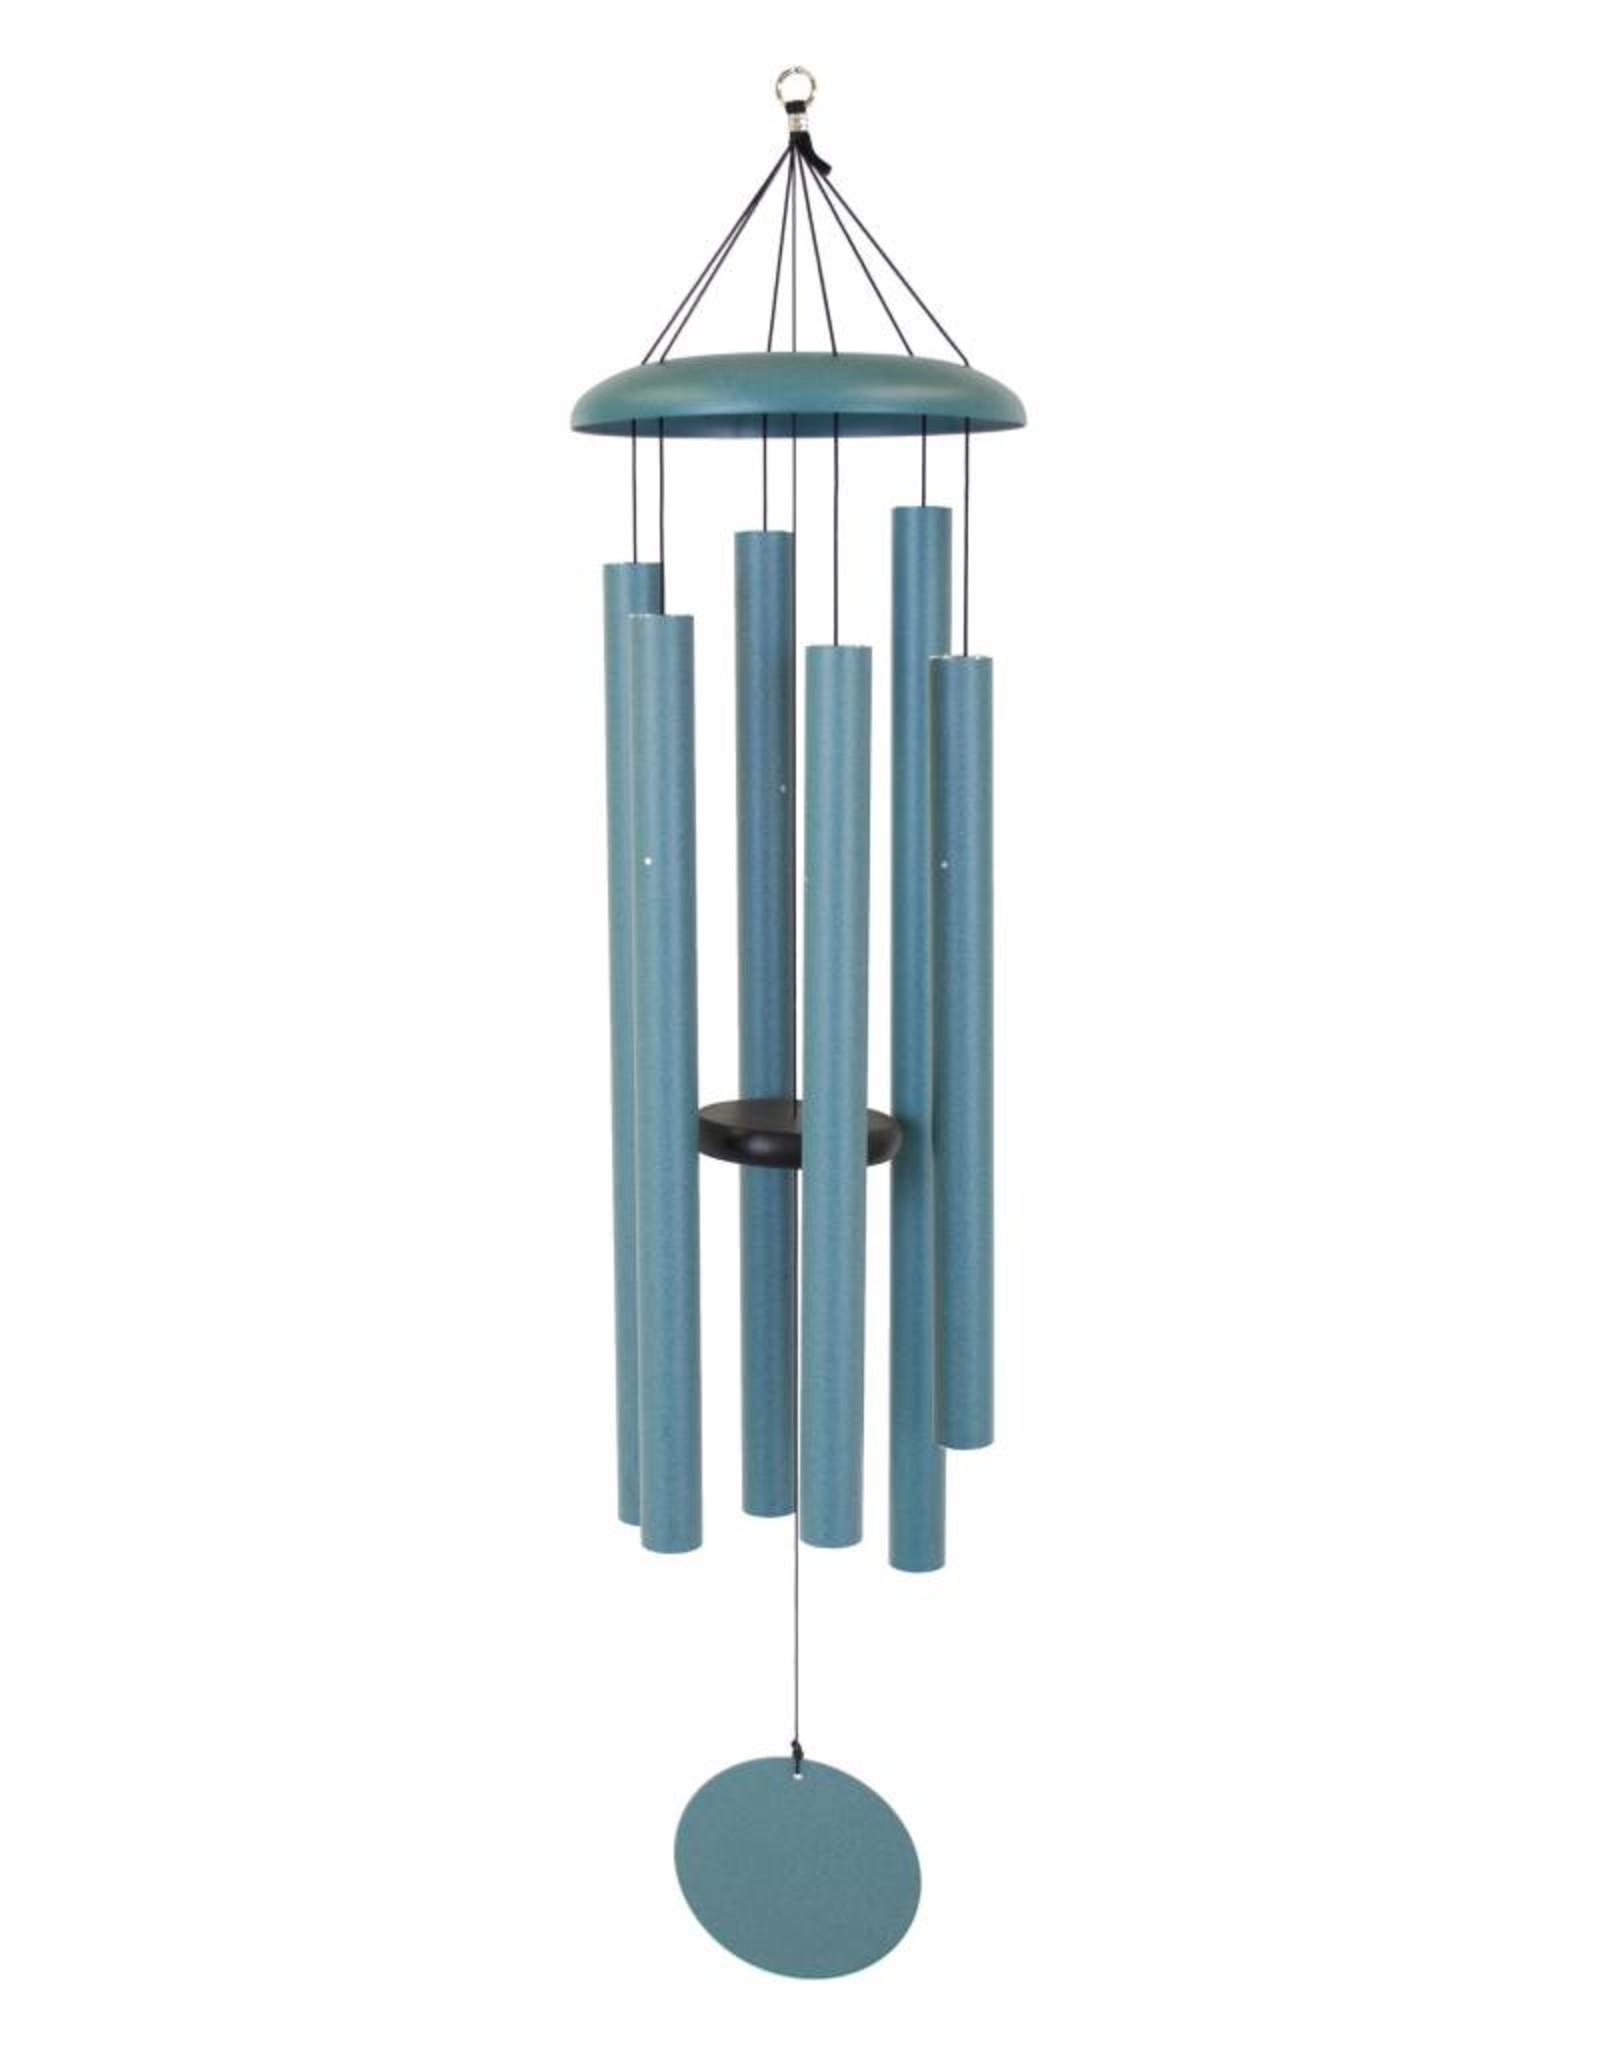 Corinthian Bells Corinthian Bells Windchimes - 56 Inches